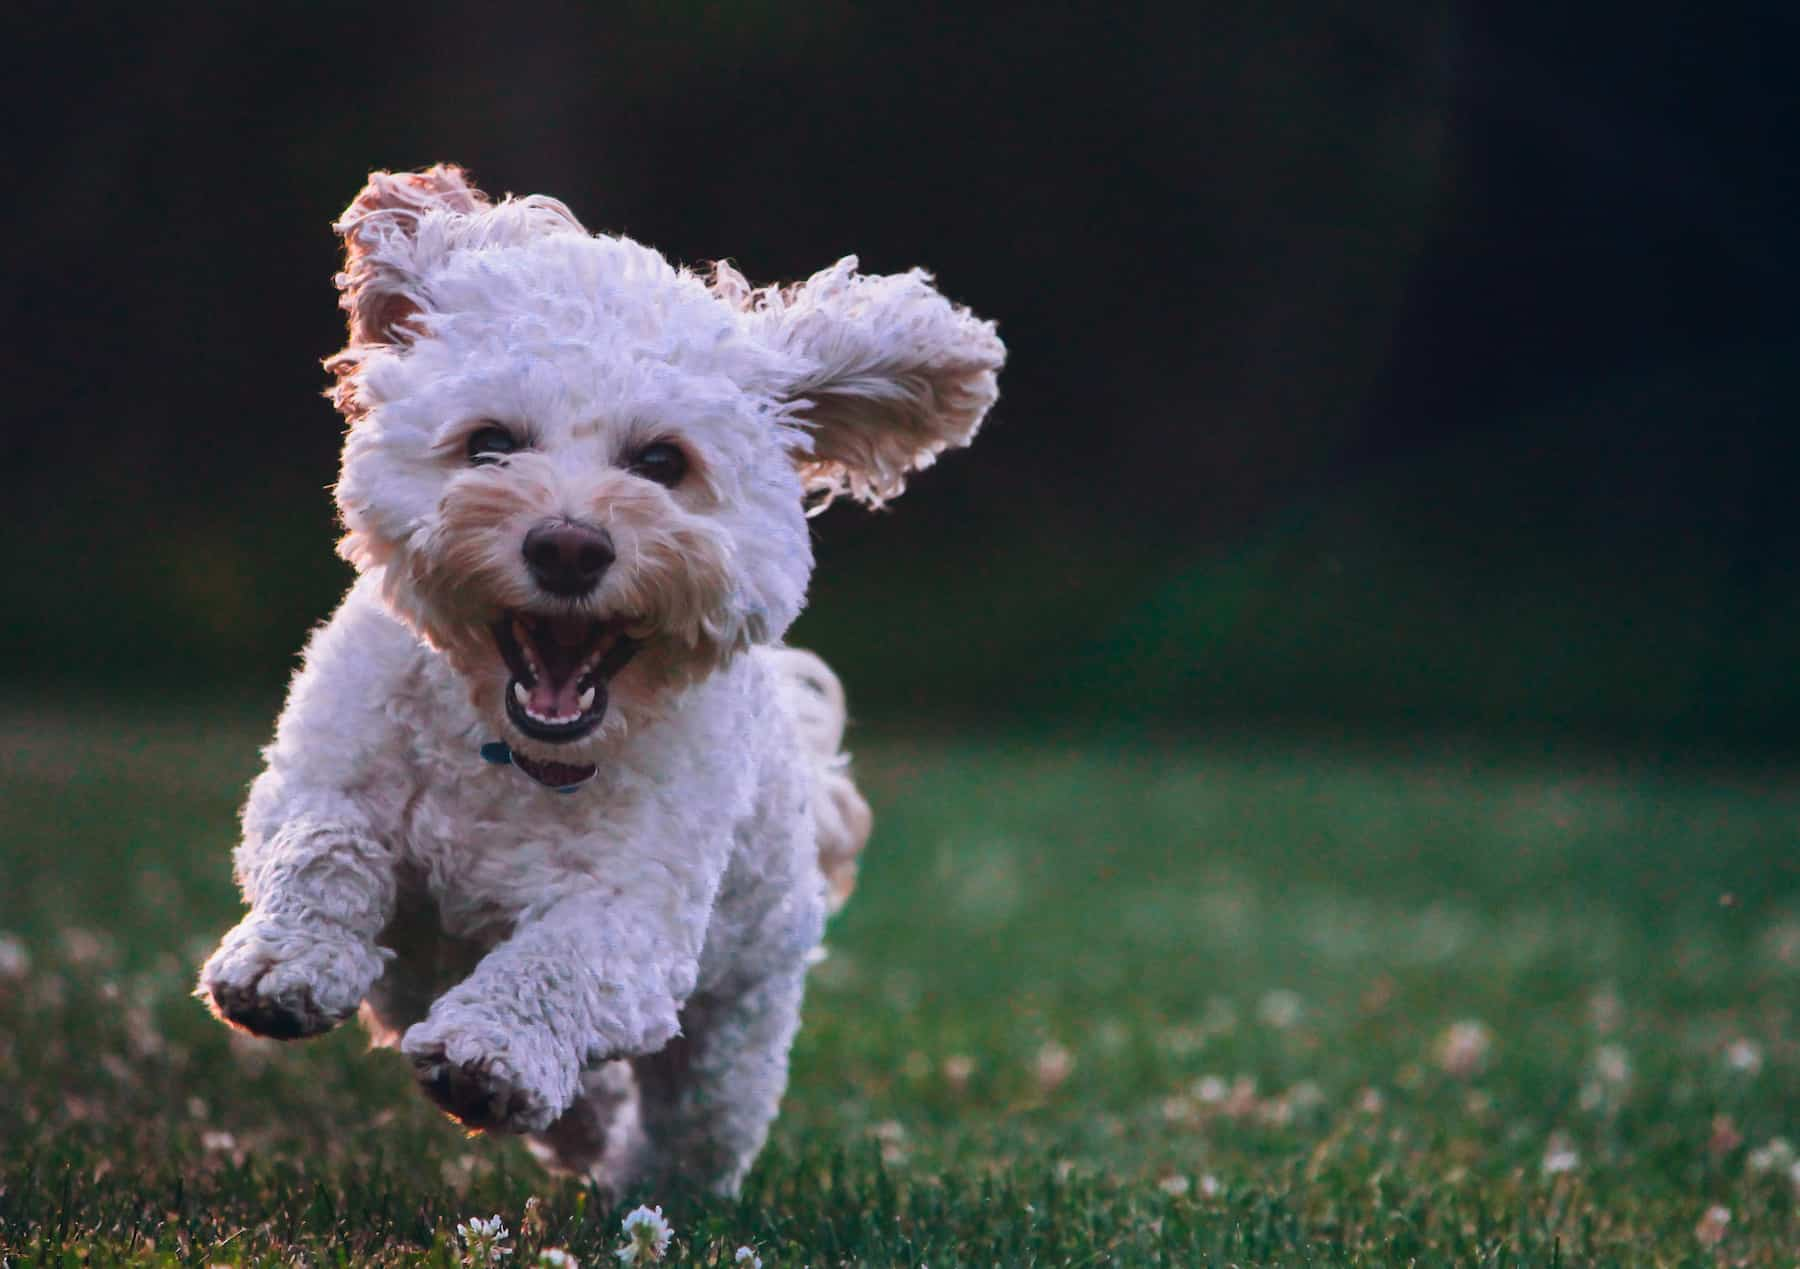 happy dog running and barking